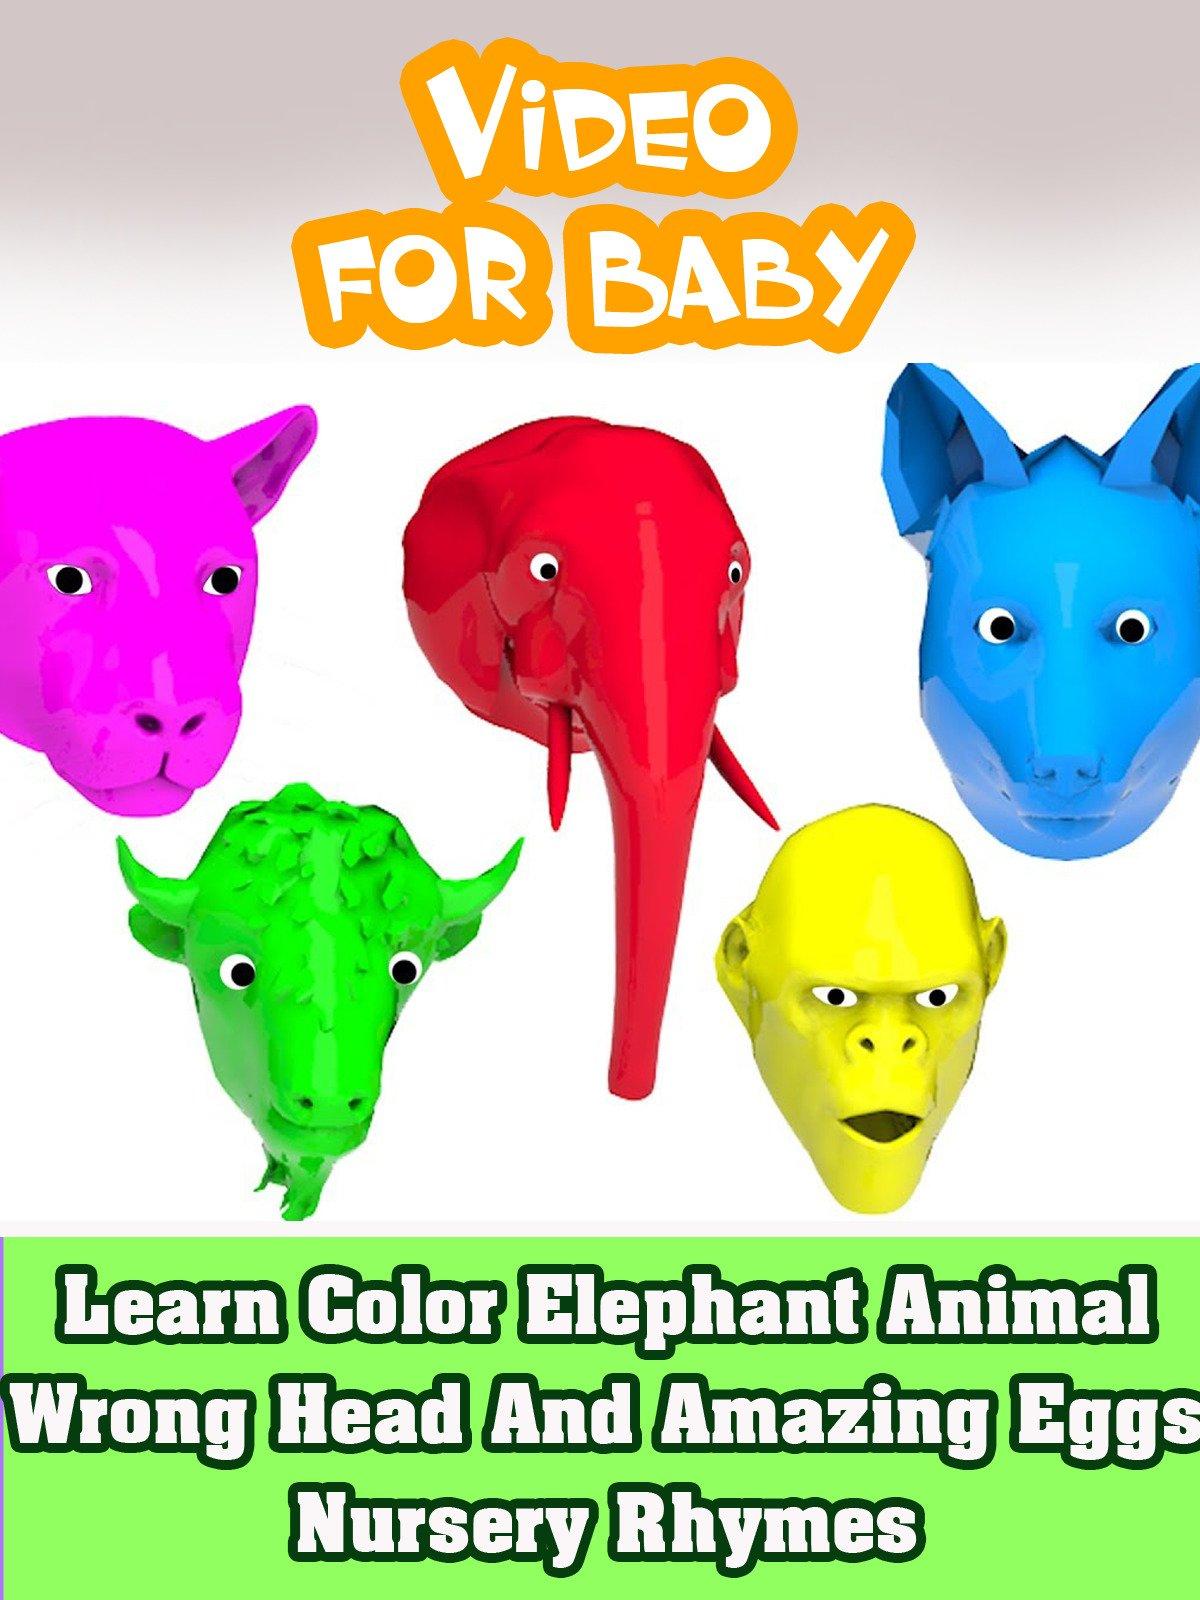 Learn Color Elephant Animal Wrong Head And Amazing Eggs Nursery Rhymes